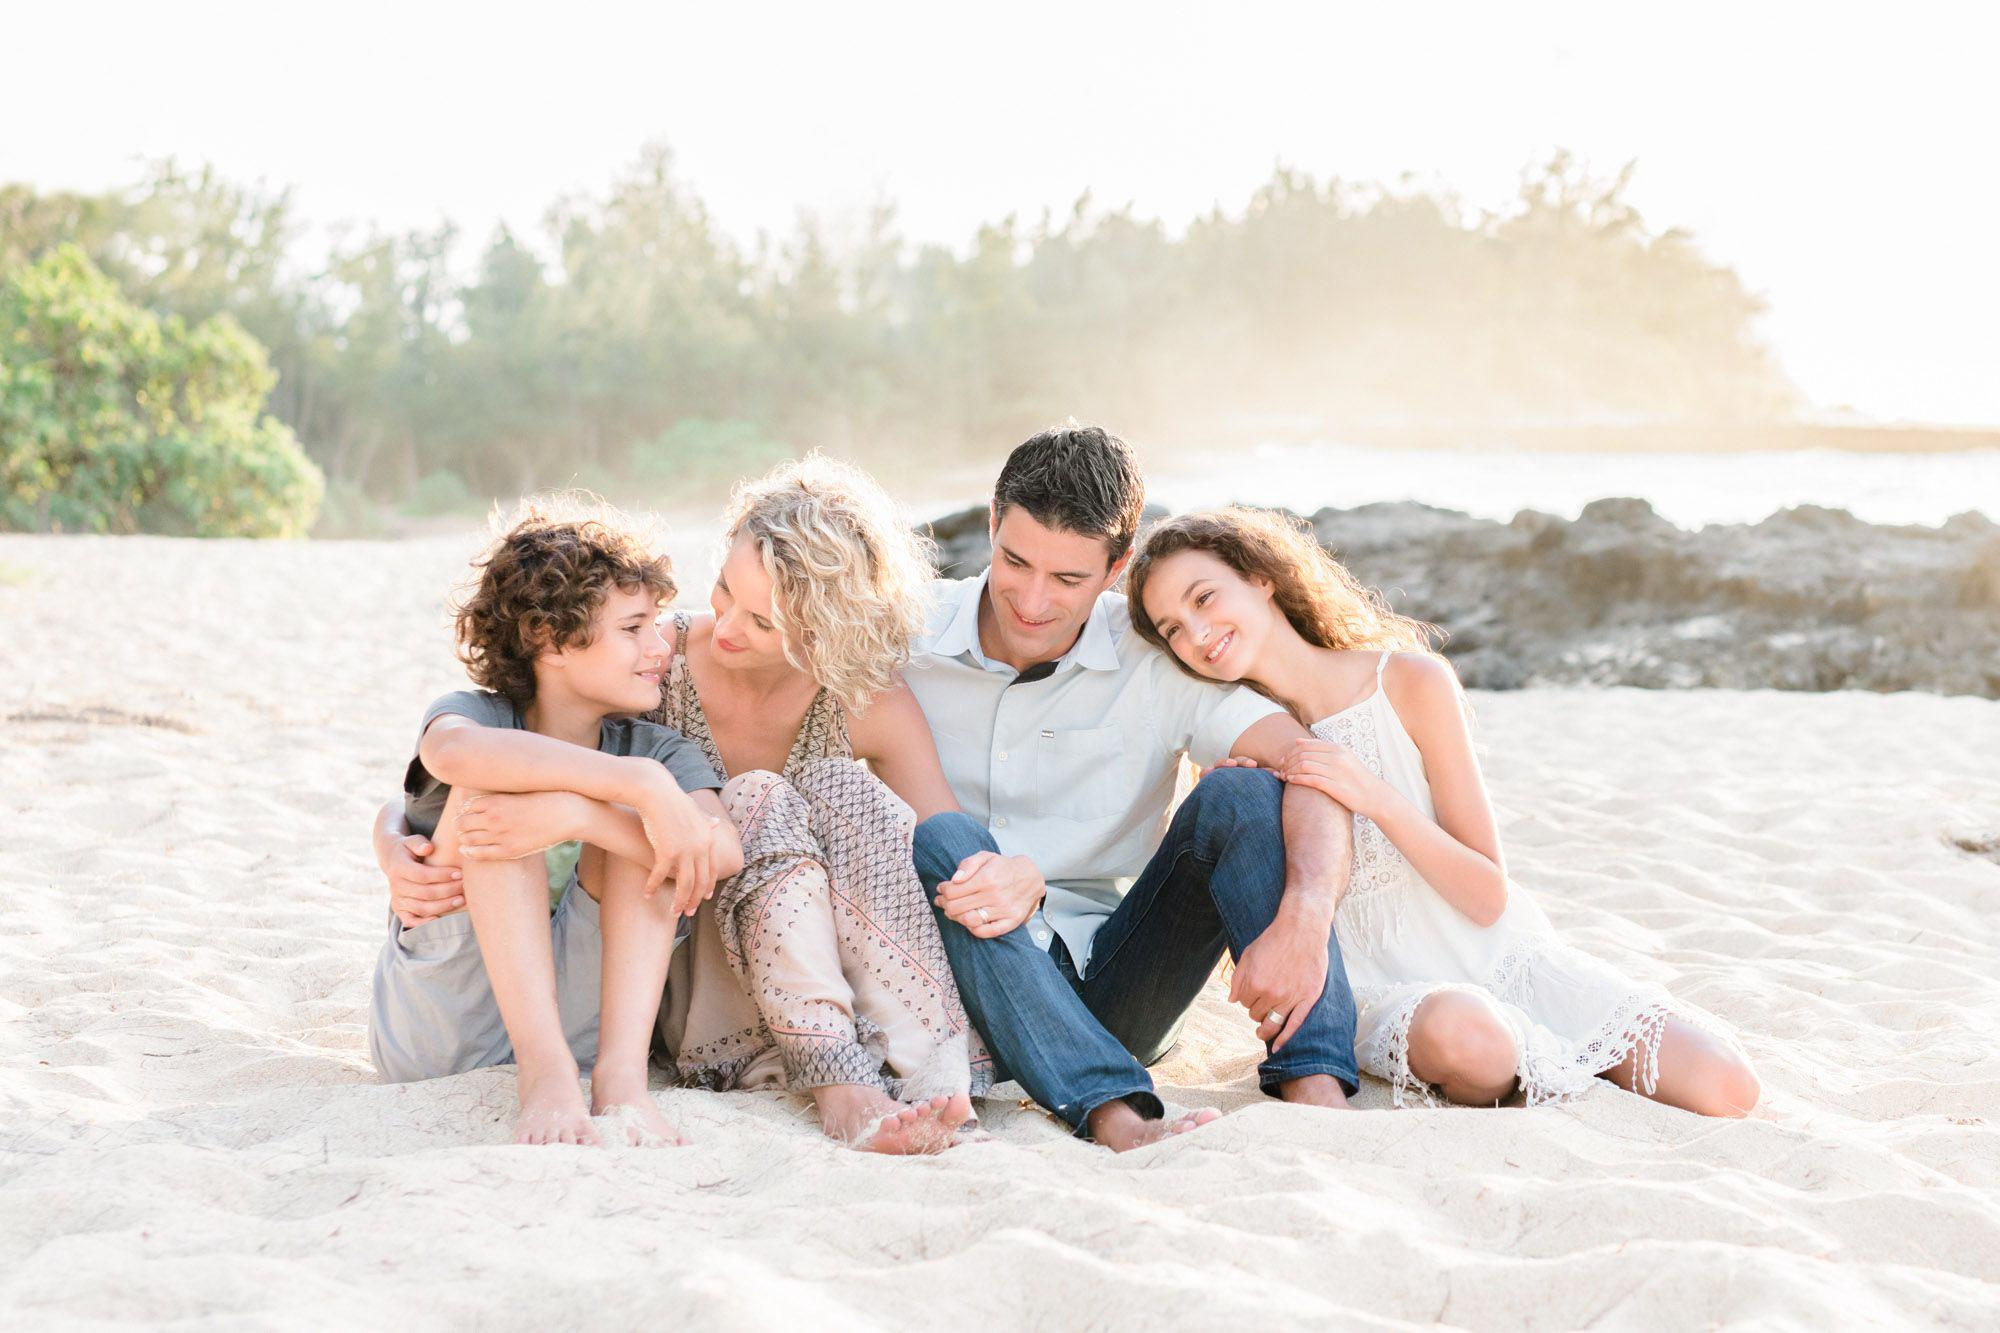 Oahu Family Beach Session | Honolulu Portrait Photography